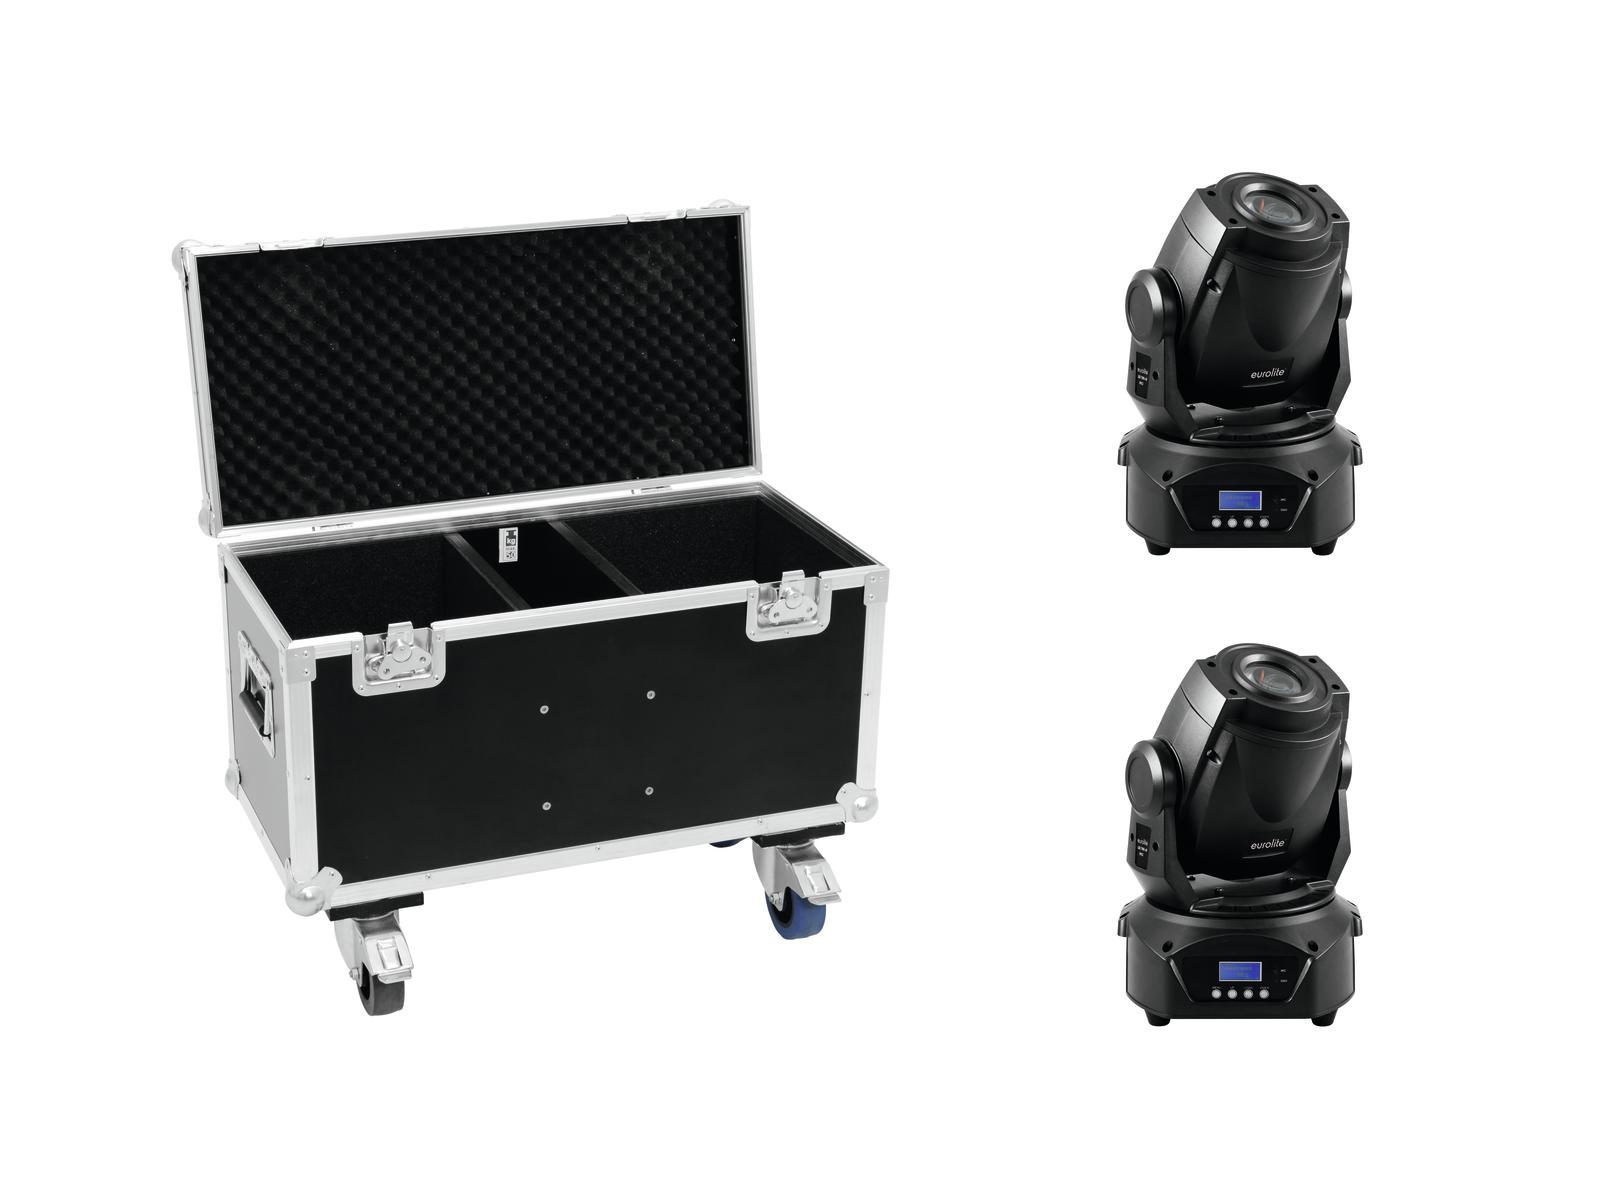 EUROLITE Set 2x LED TMH-60 MK2